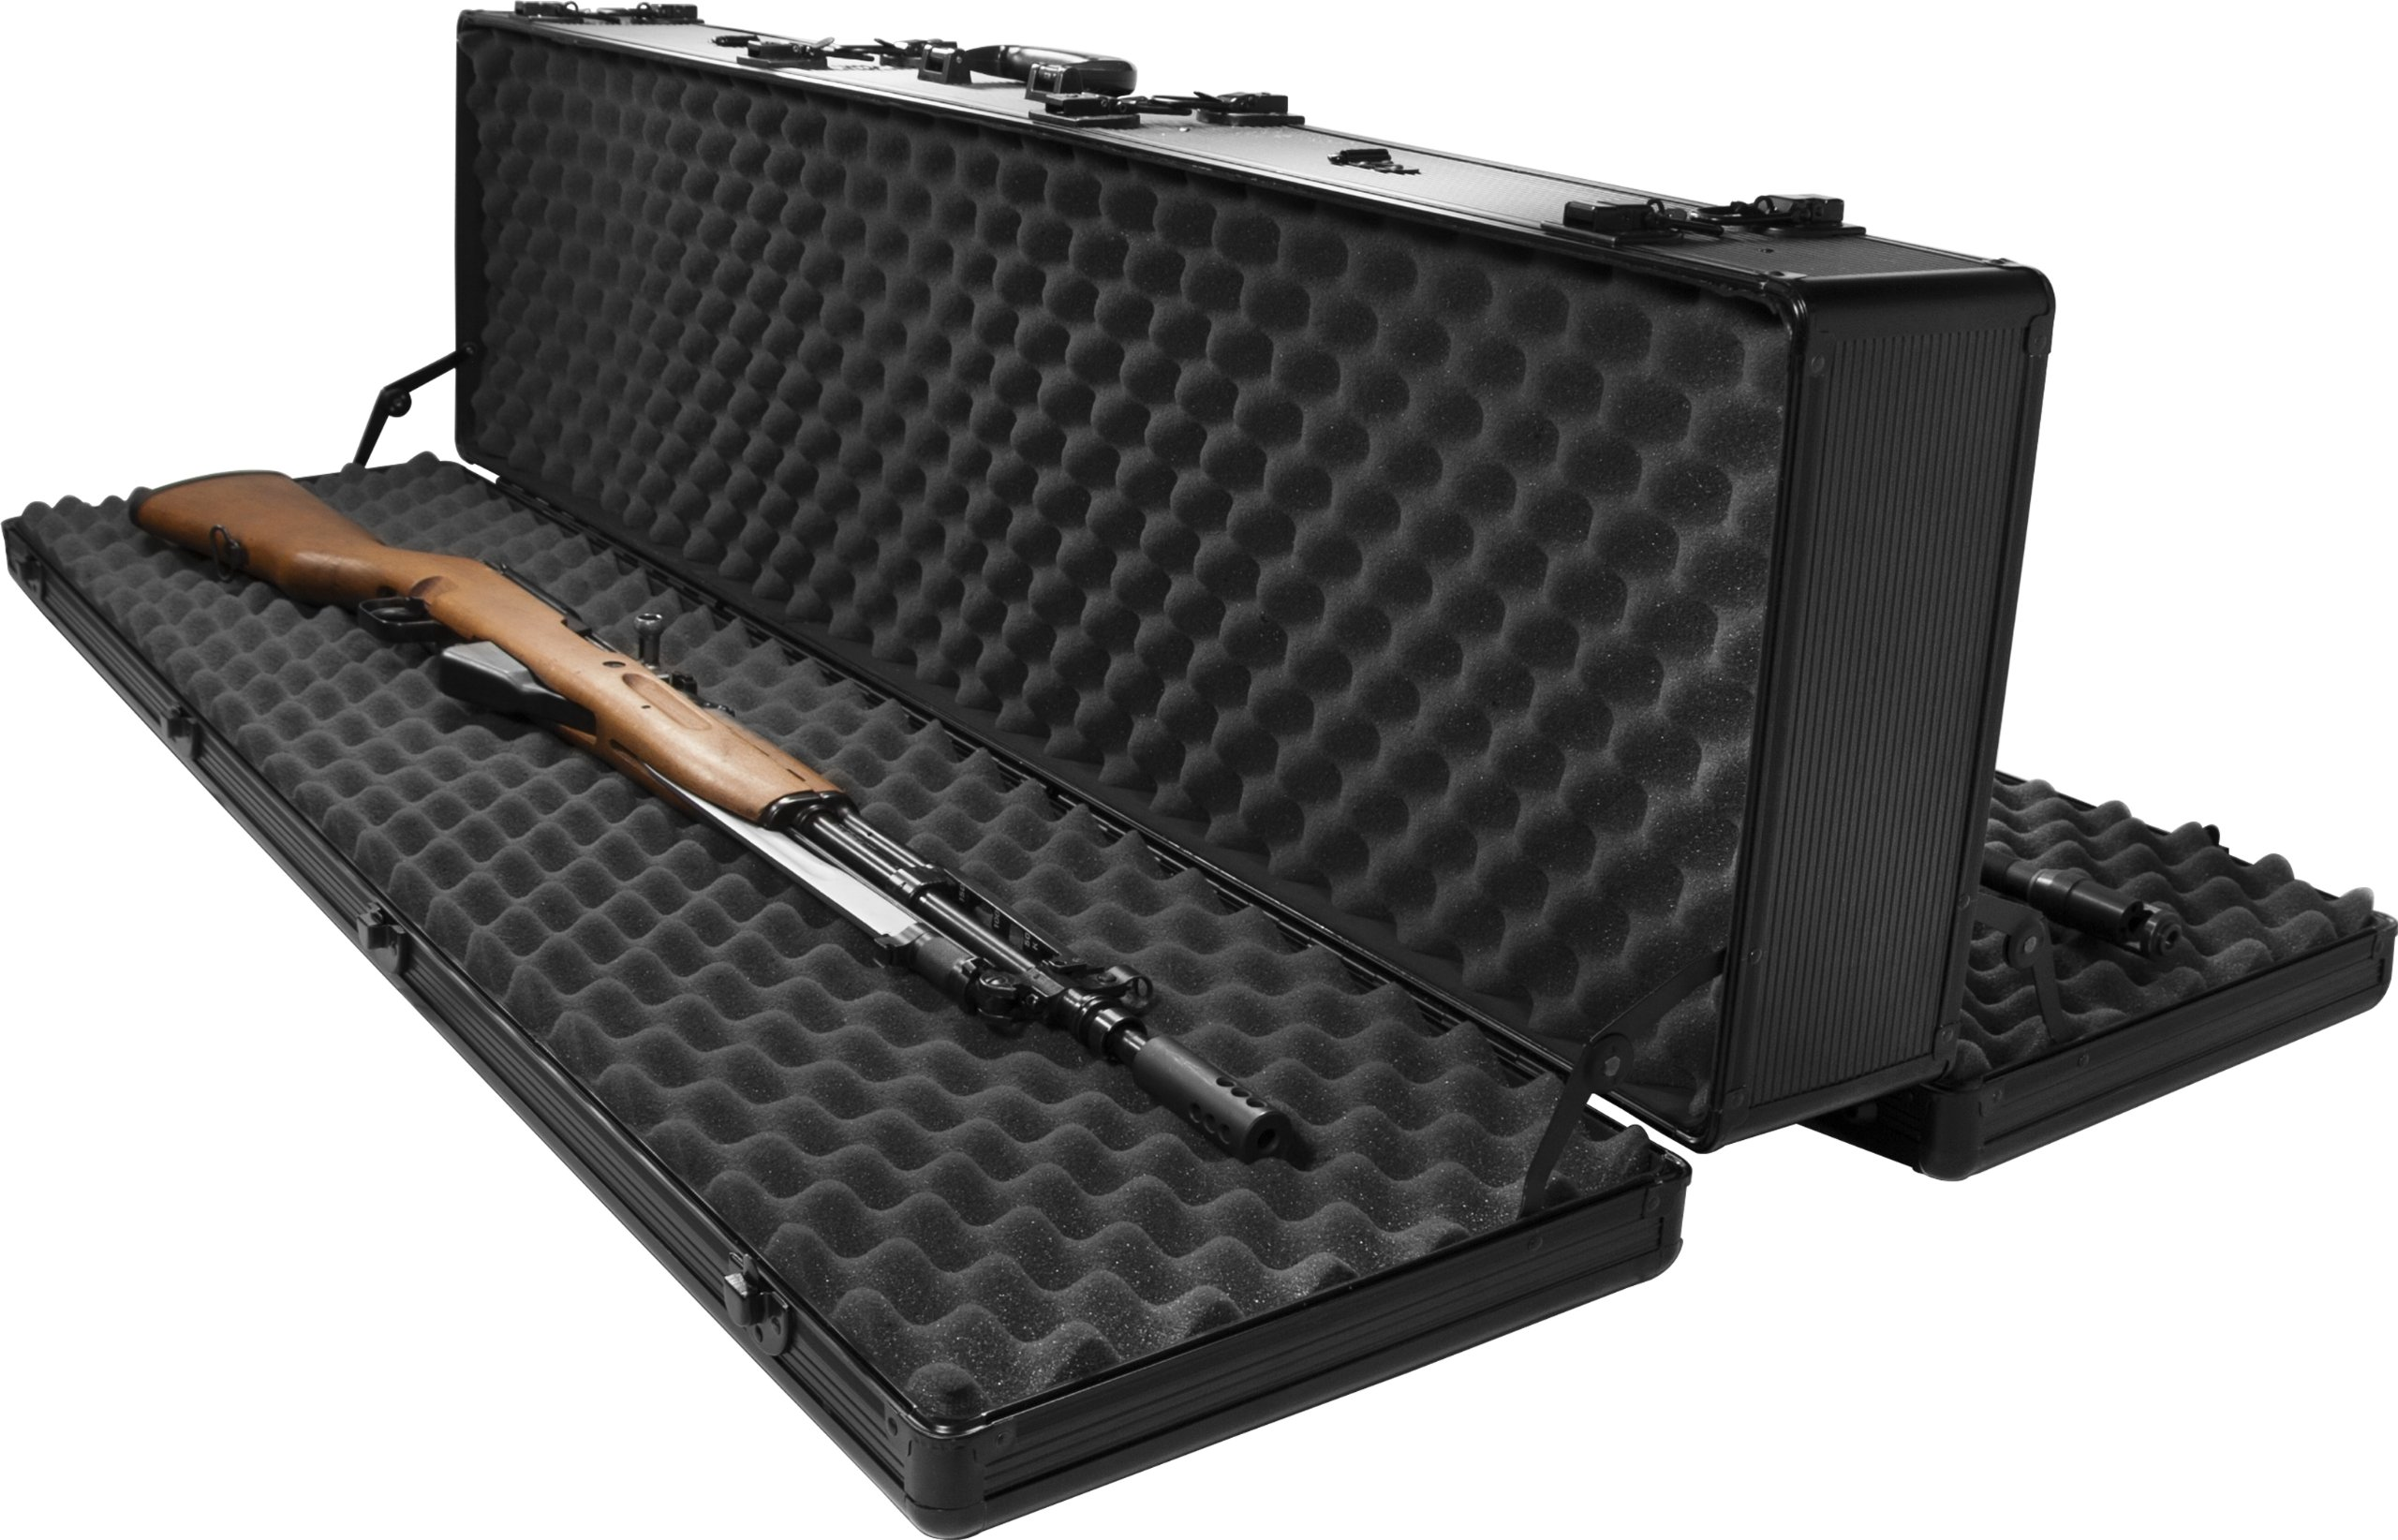 Barska BH11982  Loaded Gear AX-400 Hard Rifle Case, Black by BARSKA (Image #2)